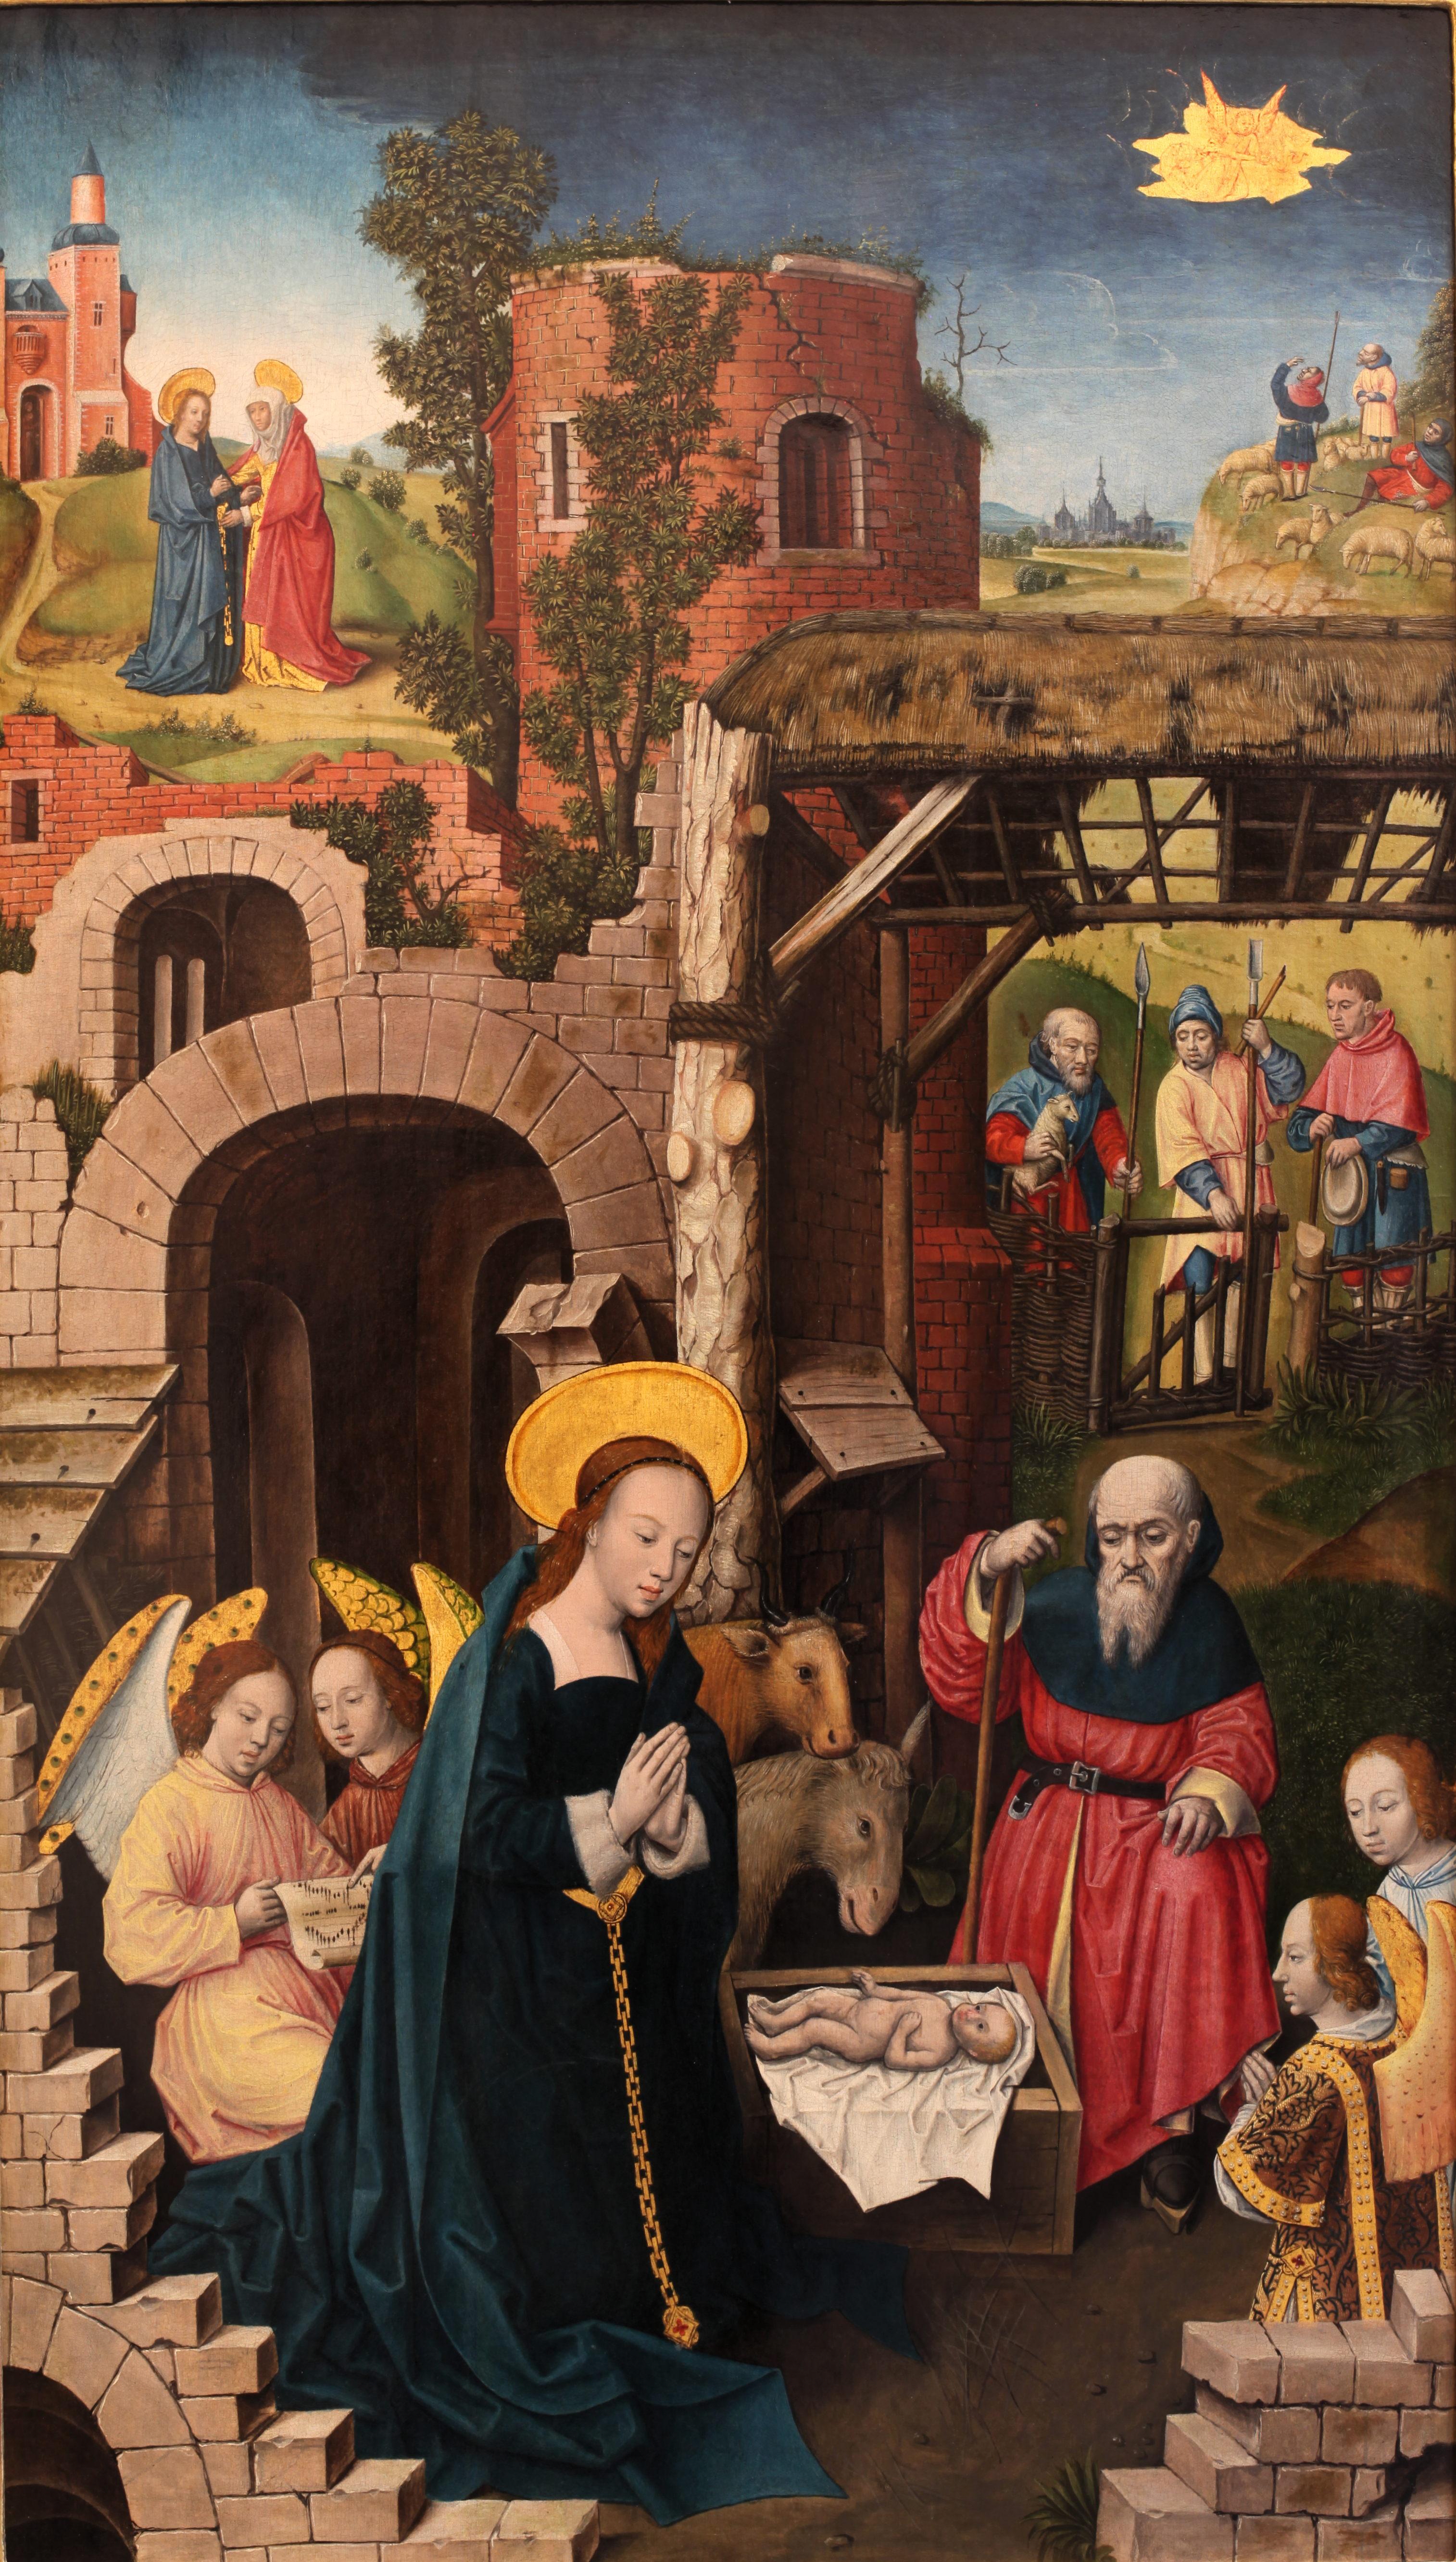 https://upload.wikimedia.org/wikipedia/commons/1/1e/Nativity-Master_of_monogram_AH-MBA_Lyon_H647a-IMG_0245.jpg